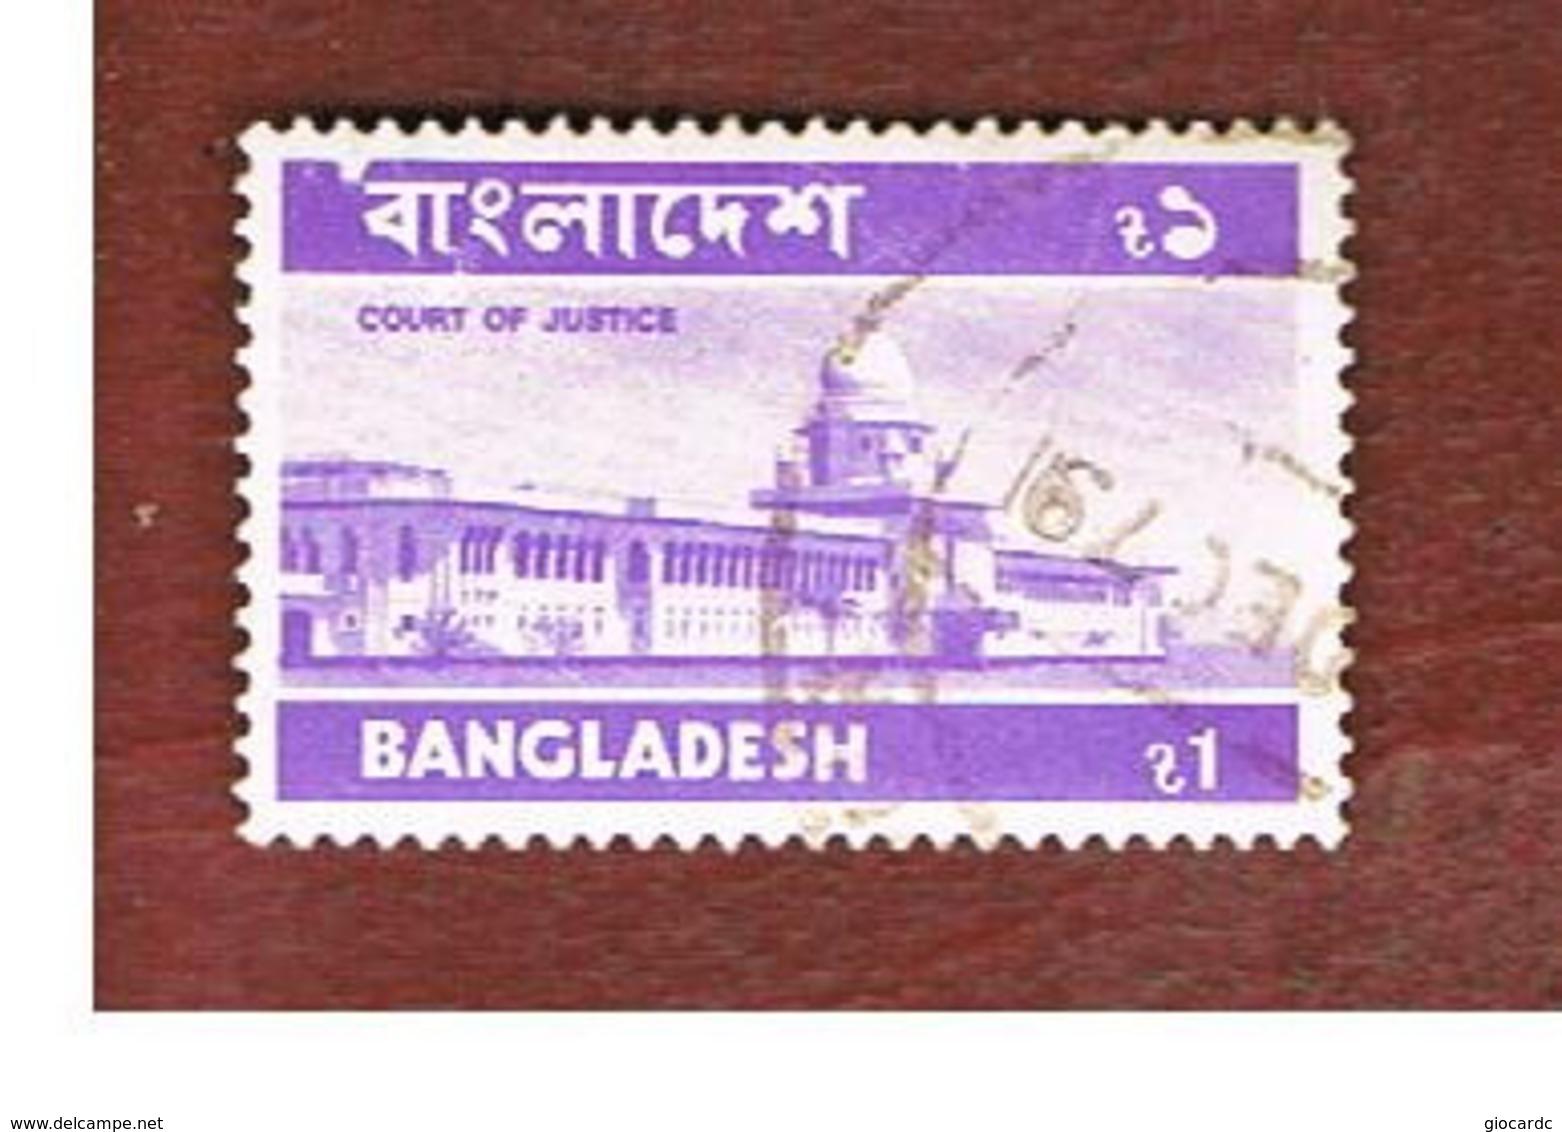 BANGLADESH  -  SG 72  -  1976 COURT OF JUSTICE   (32X20)         - USED  ° - Bangladesh